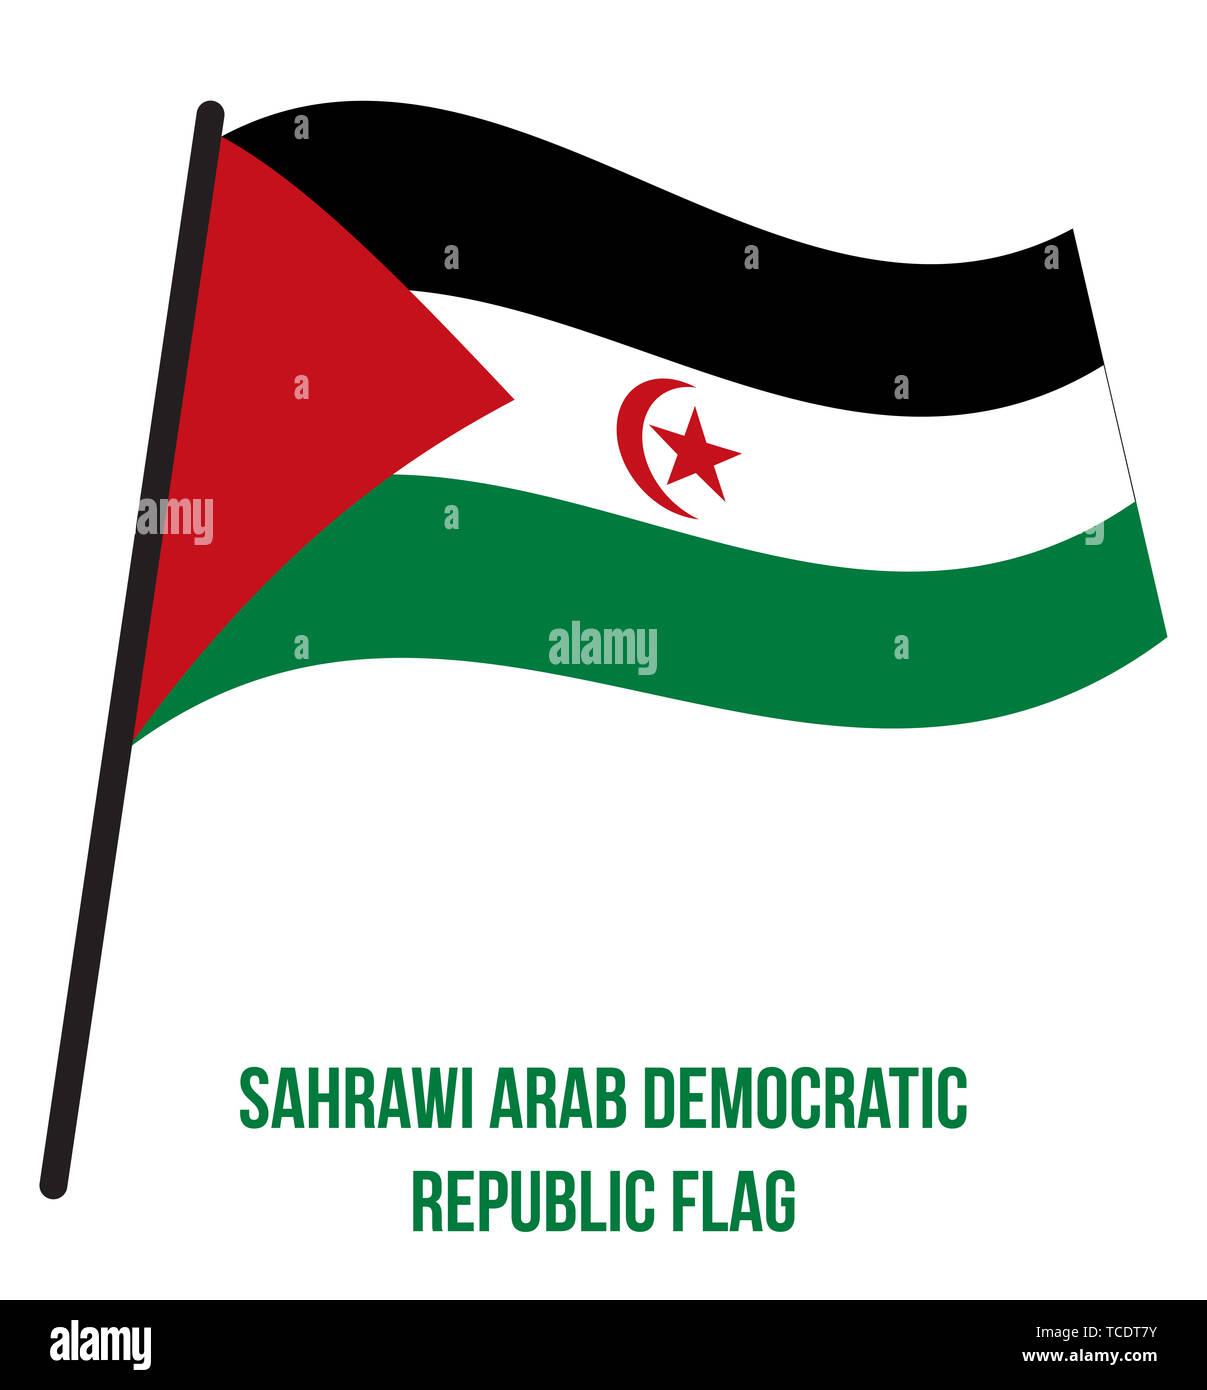 Sahrawi Arab Democratic Republic Flag Waving Vector Illustration on White Background. Sahrawi Arab Democratic Republic National Flag. - Stock Image